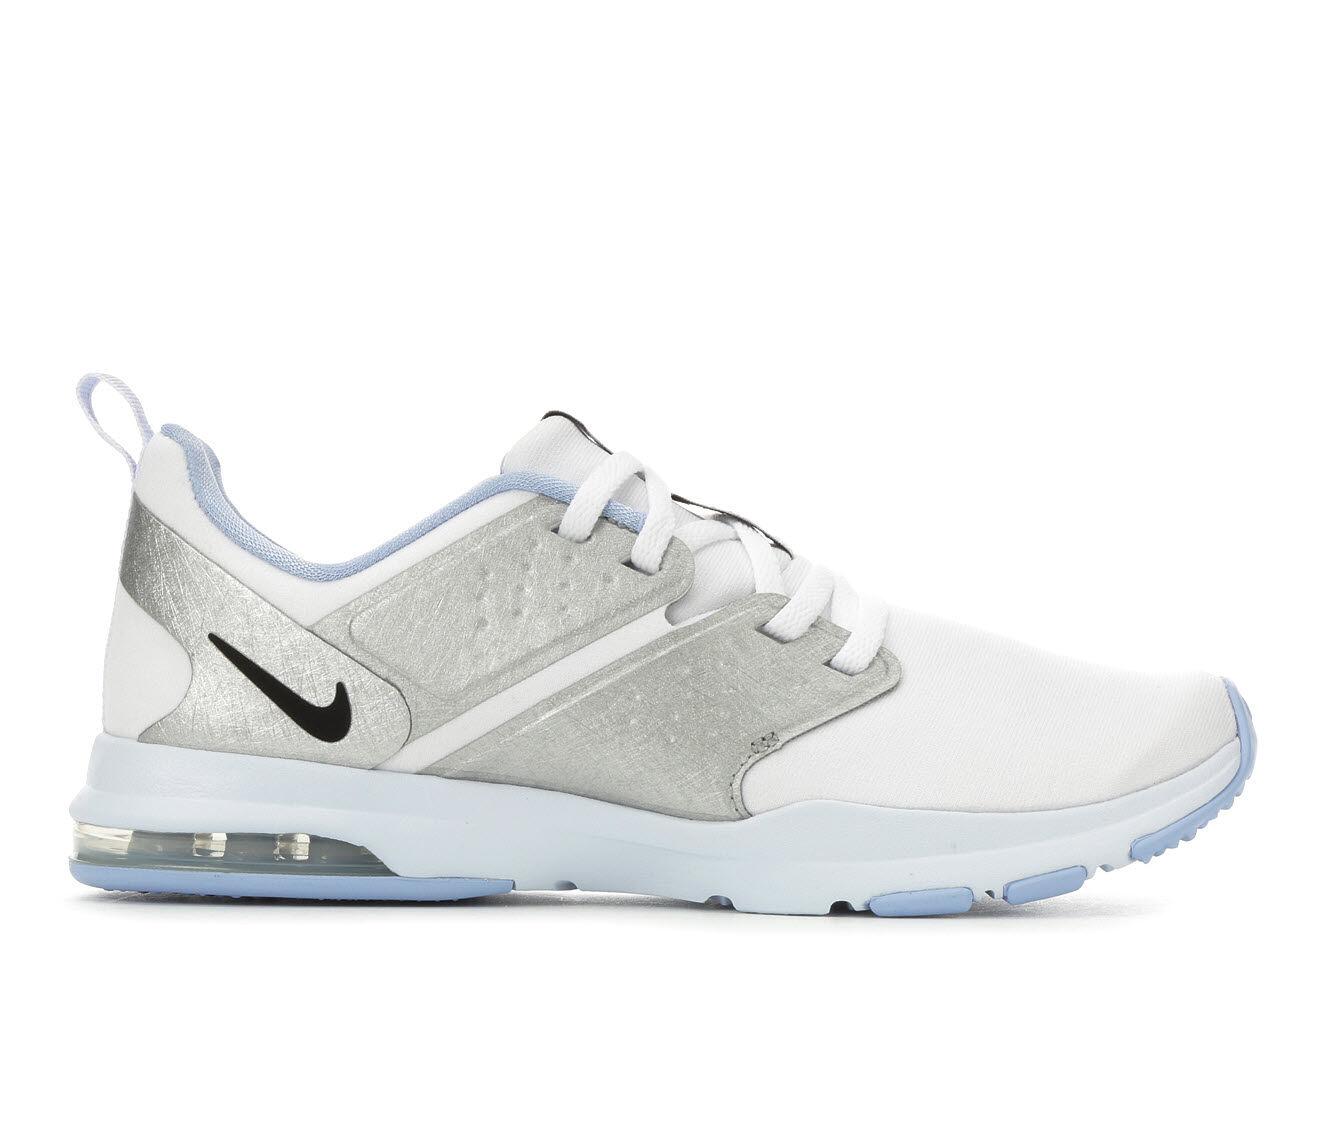 Women's Nike Air Bella TR Training Shoes Wht/Blk/Blue